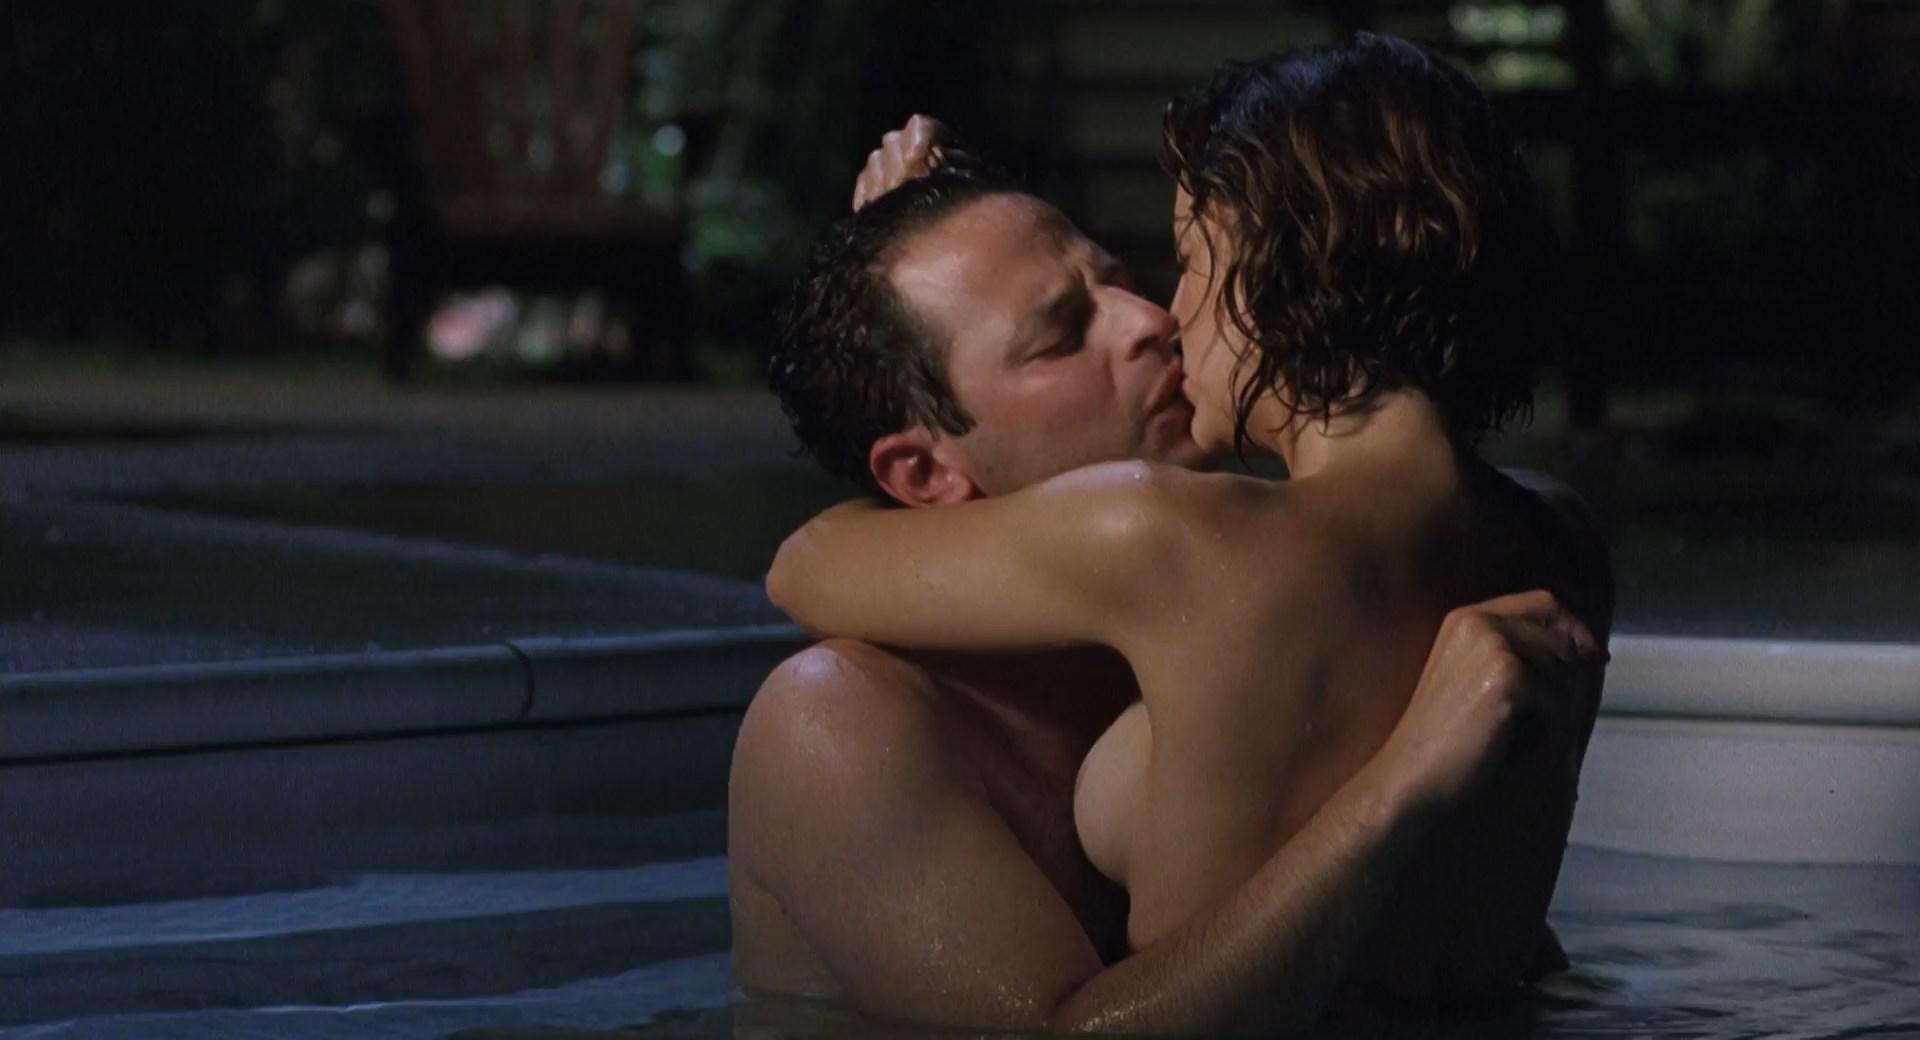 Angela Sarafyan Tits watch online - michelle borth, lindsay sloane, lake bell